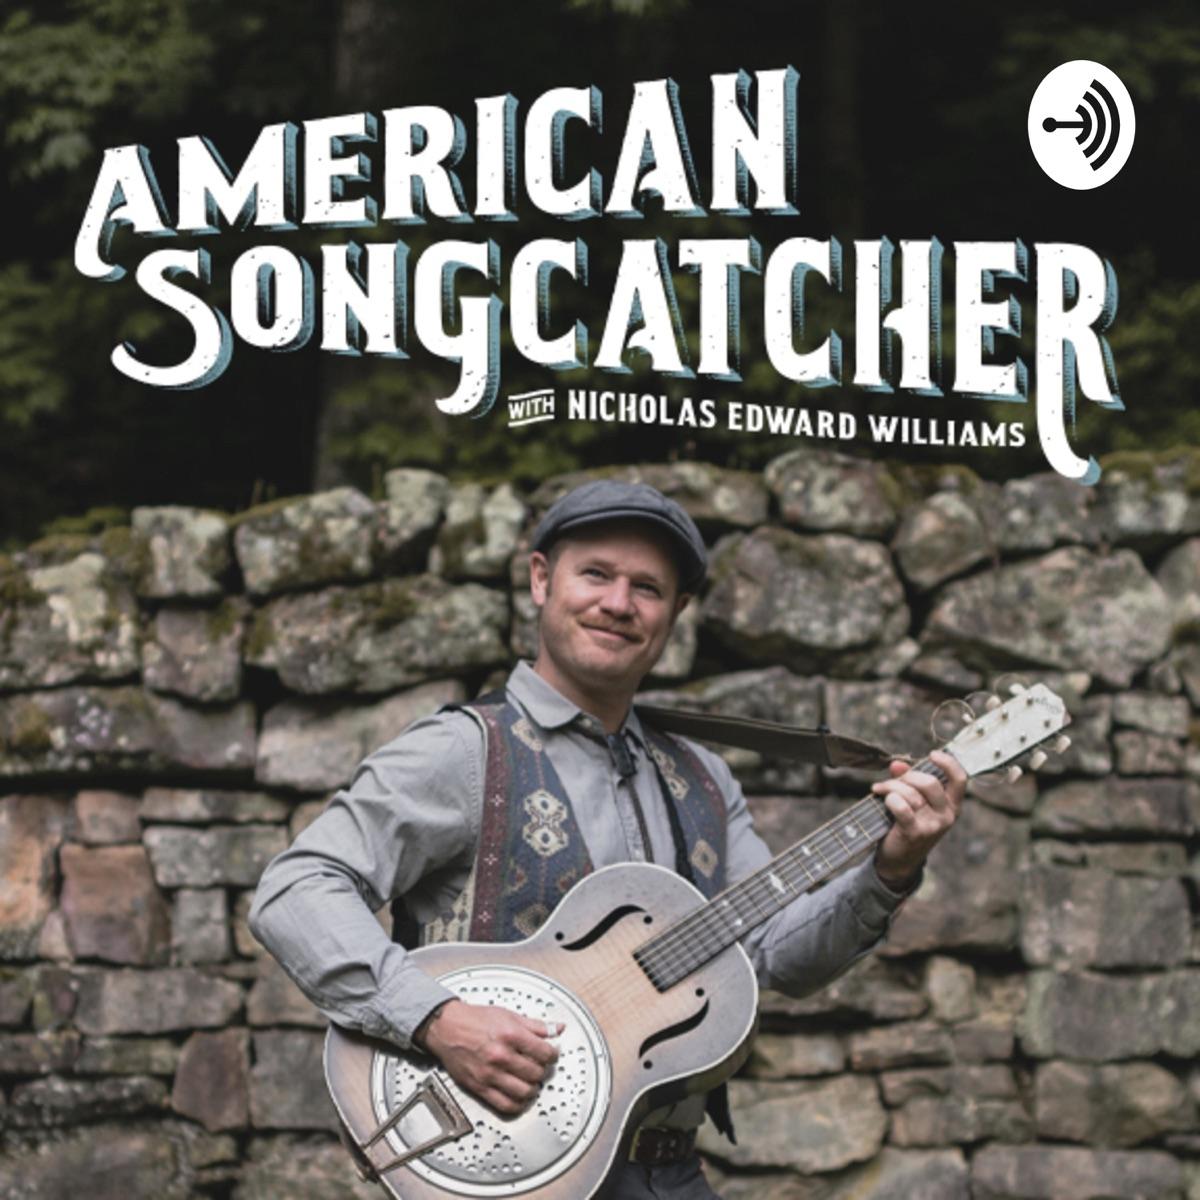 American Songcatcher